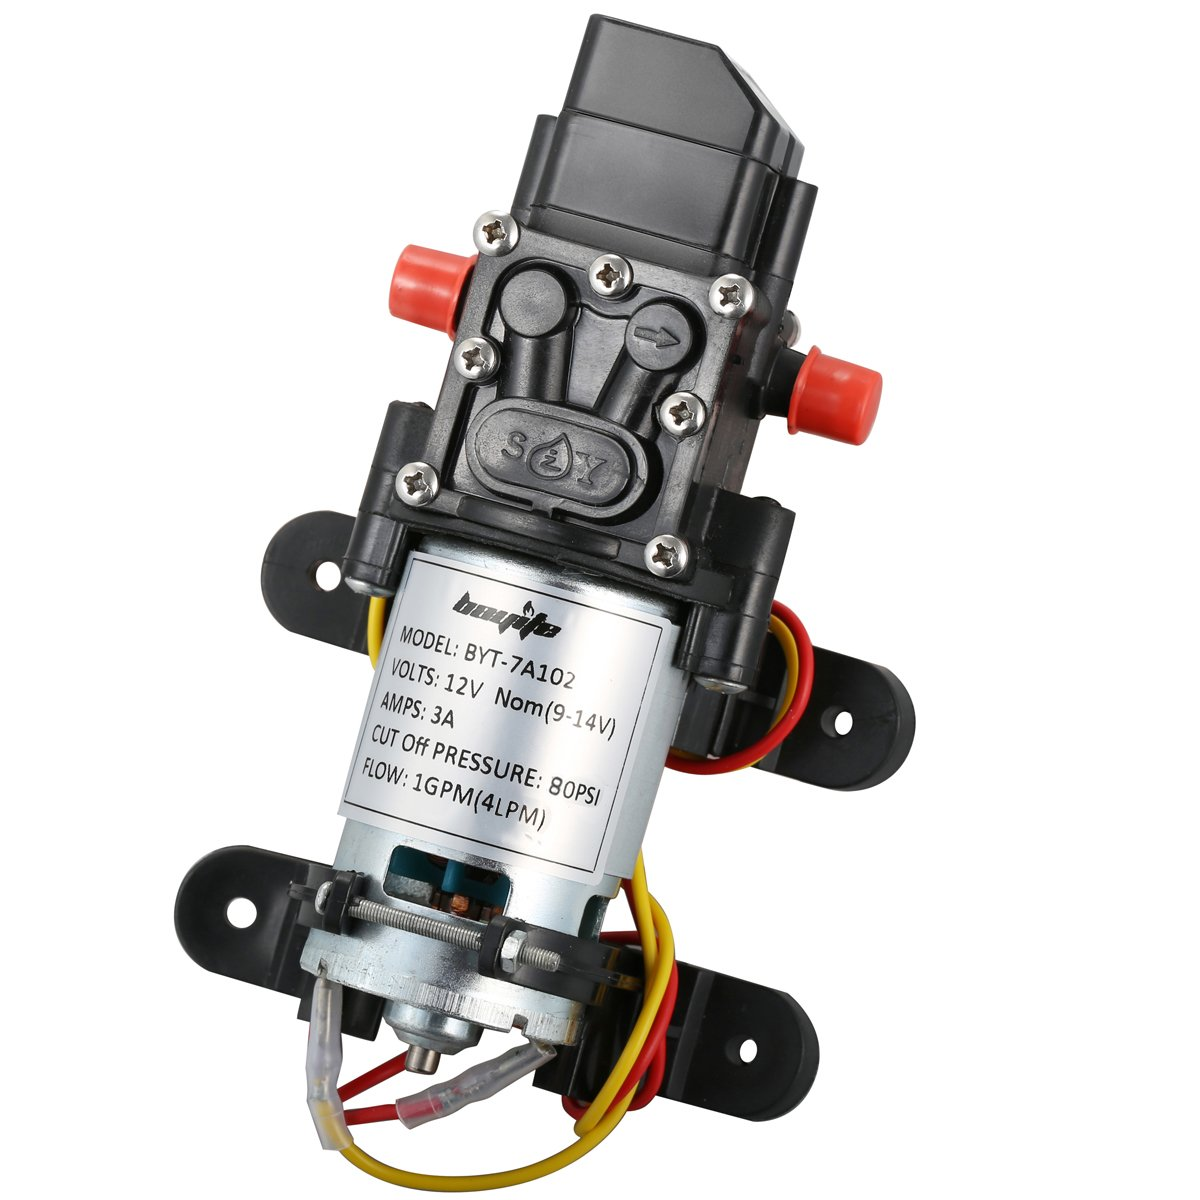 Bayite 12V DC Freshwater Pressure Pump